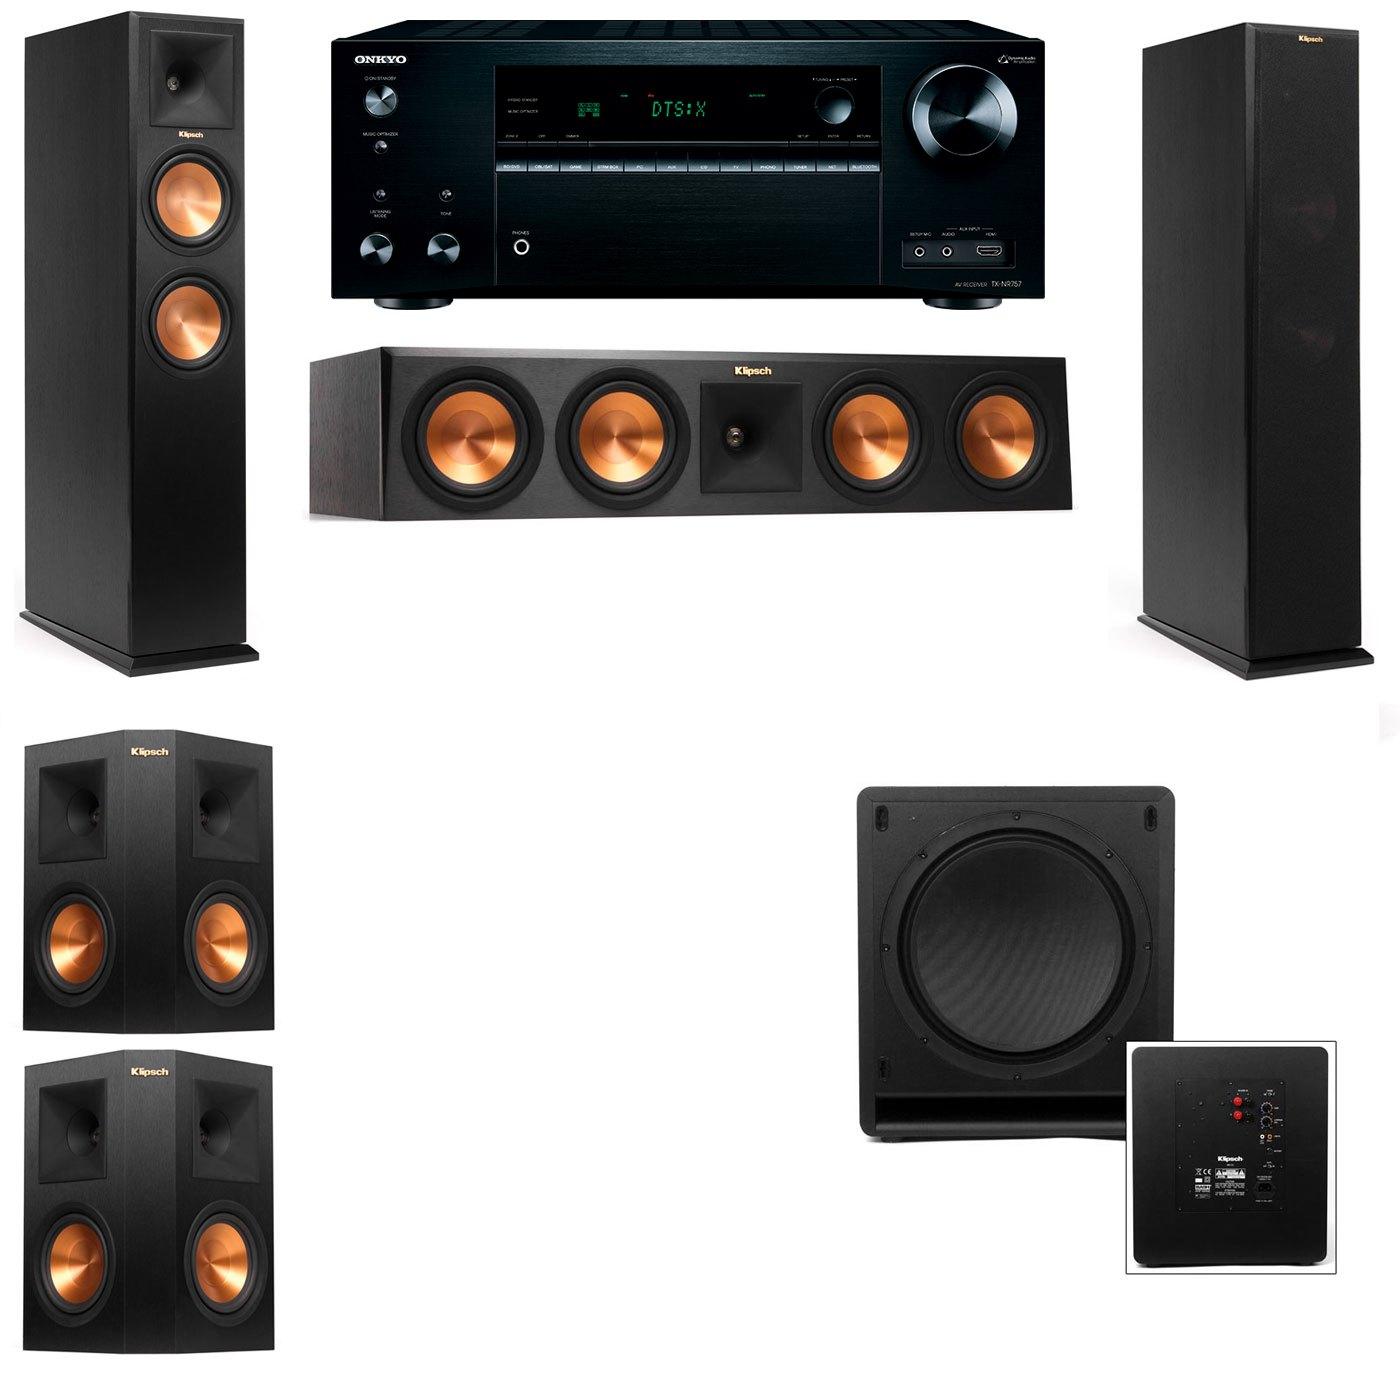 Klipsch RP-250F Tower Speakers-SW-112-5.1-Onkyo TX-NR757